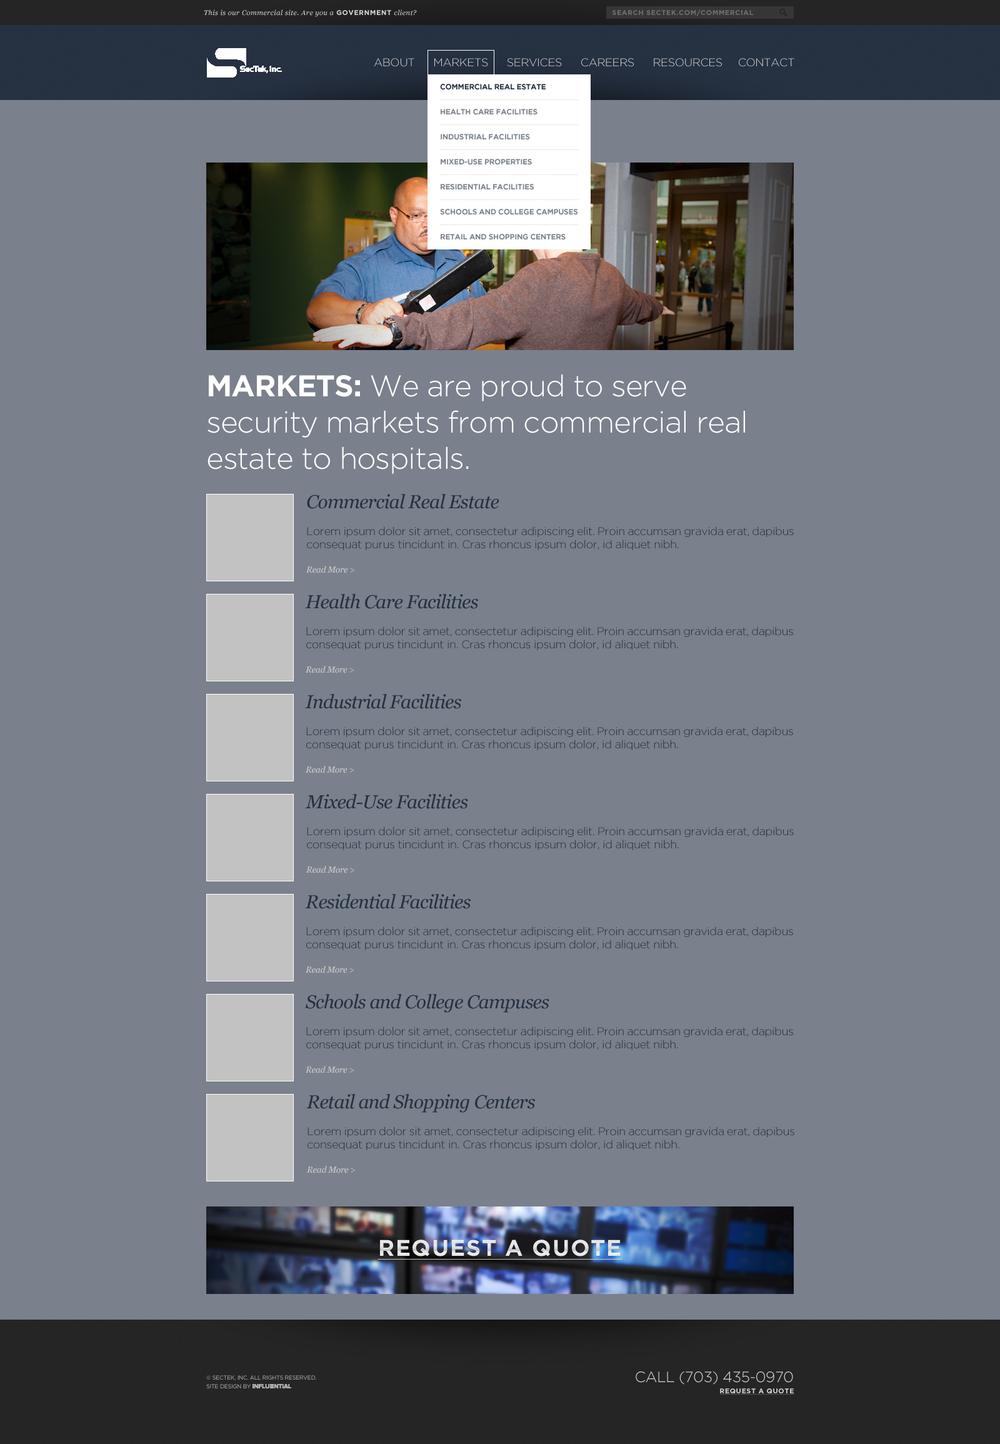 STK_Design2_Commercial_Markets_Nav-drop-down.jpg